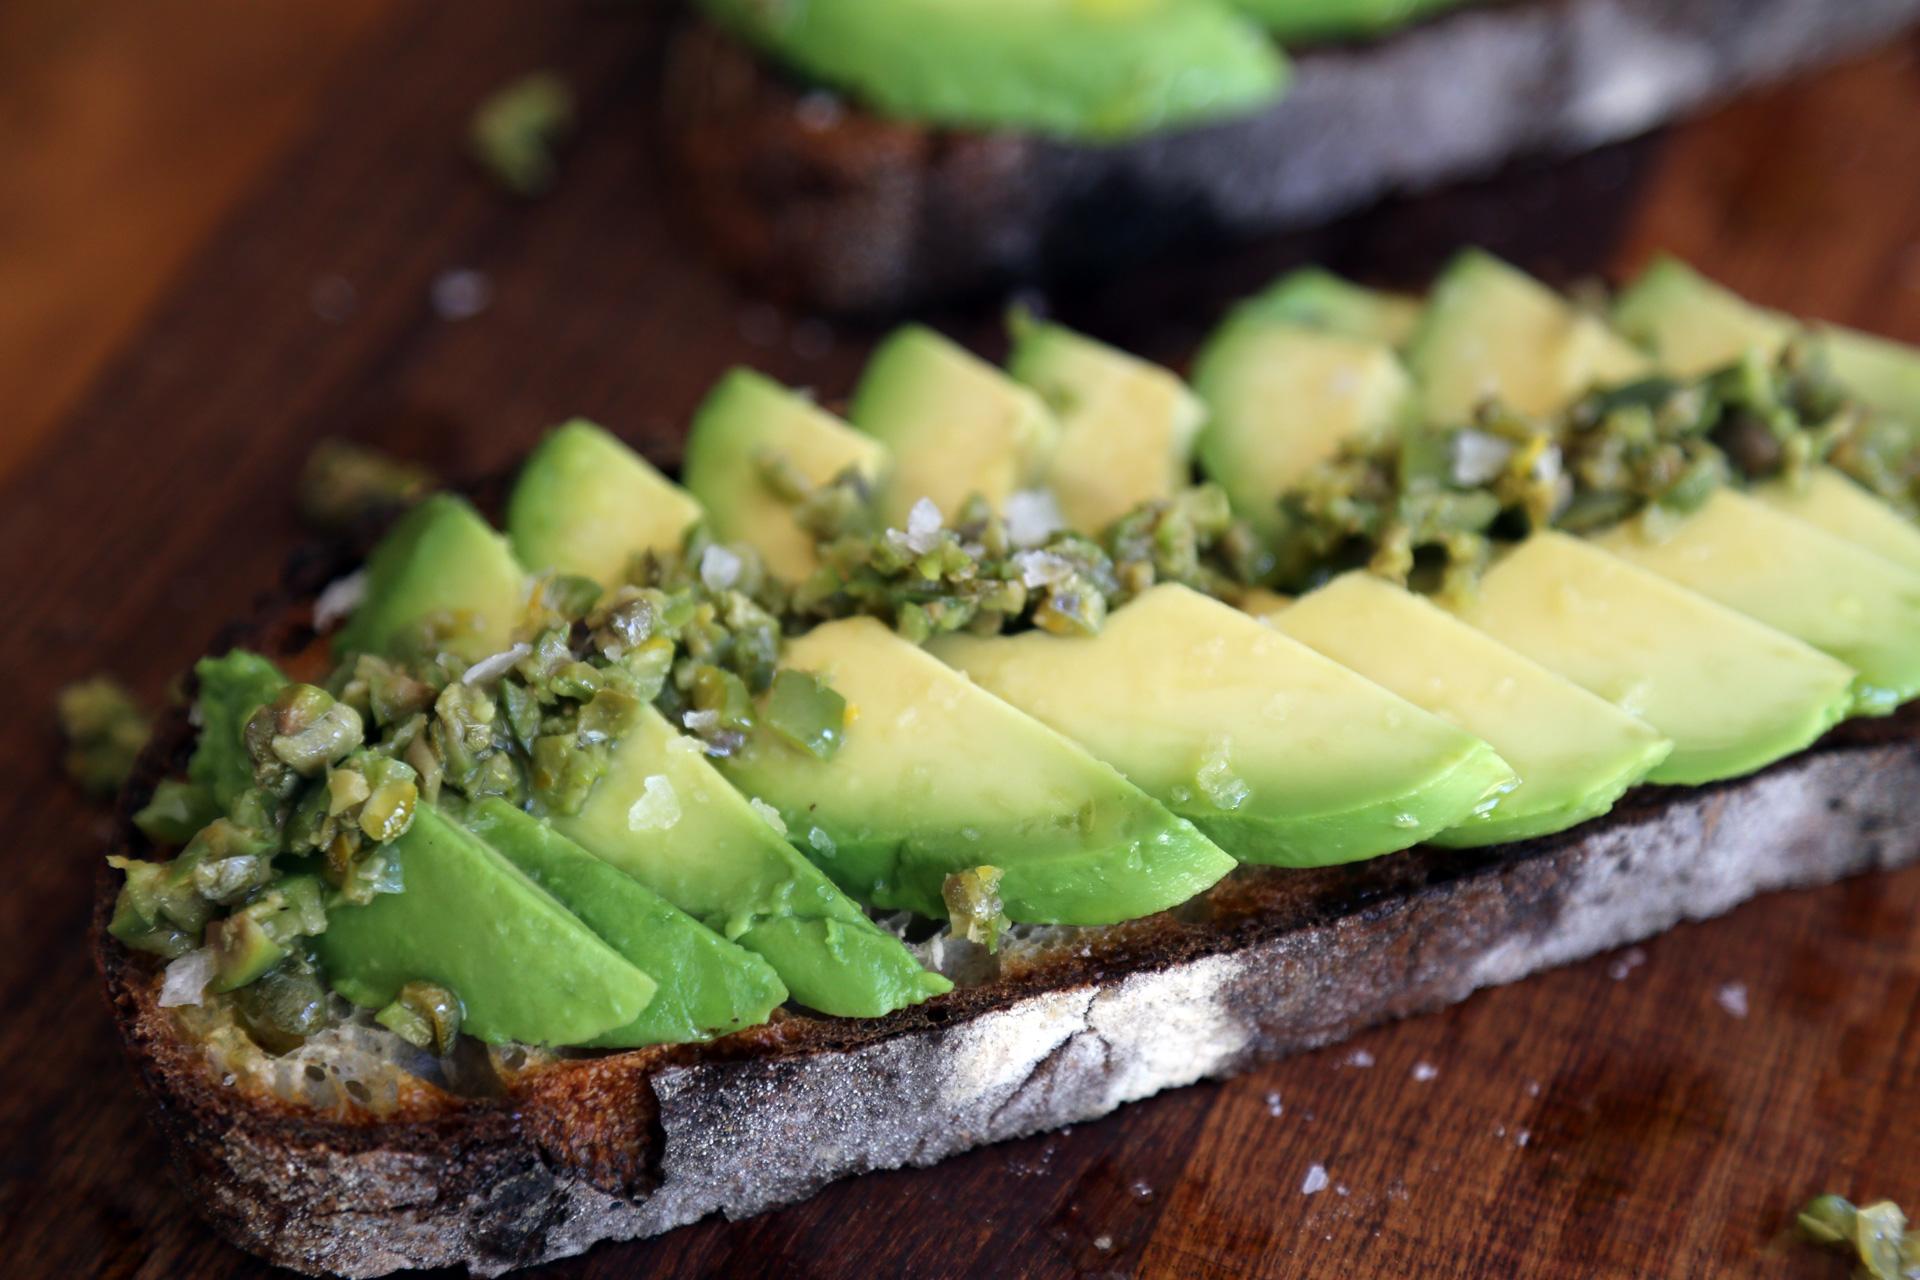 Springtime Avocado Toast with Green Olive Relish and Lemon